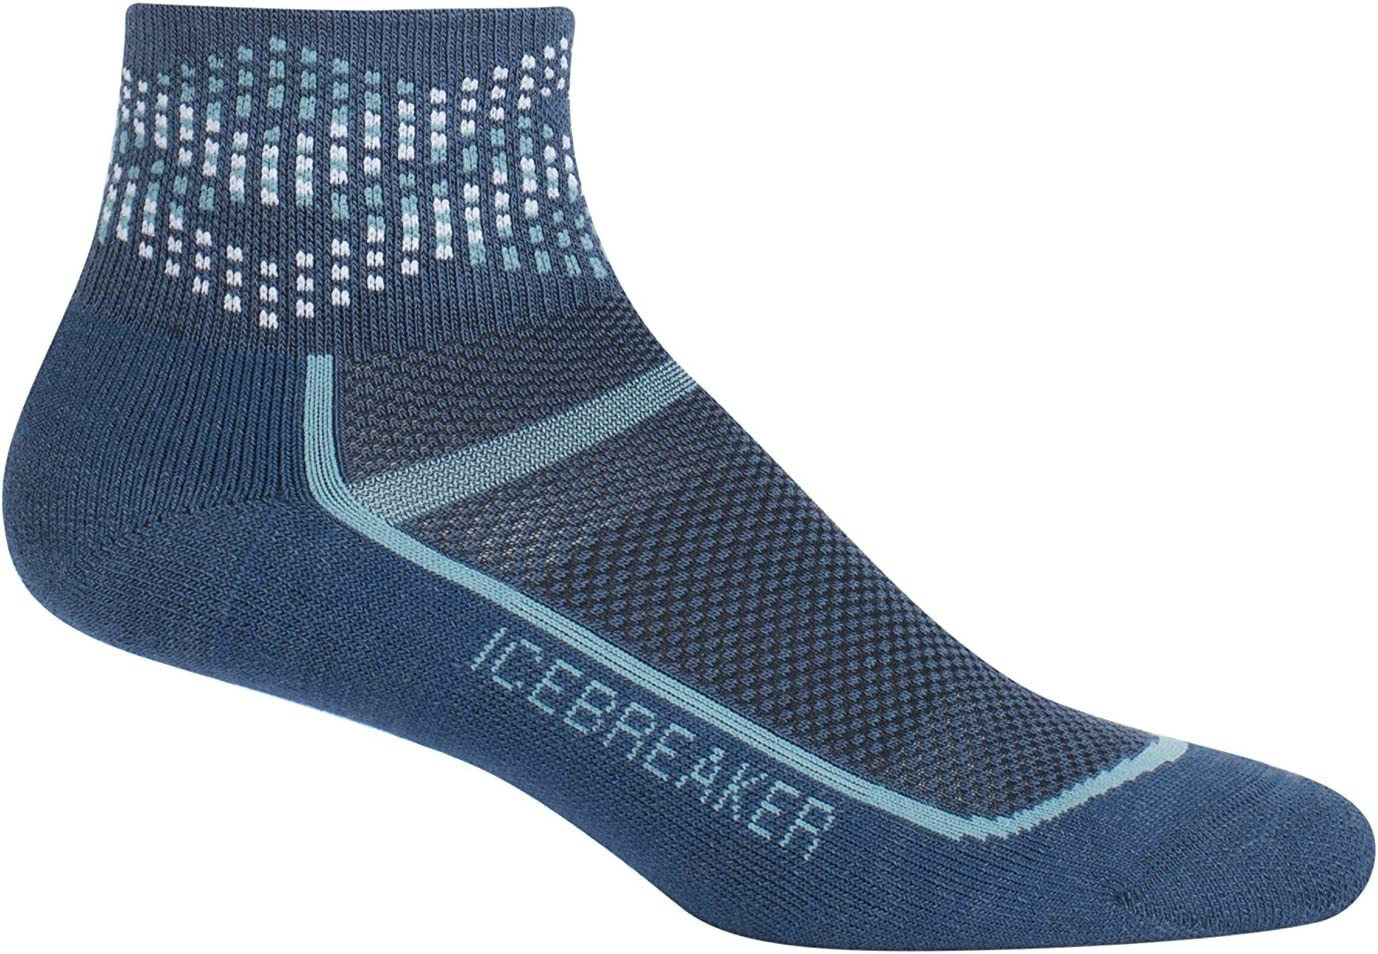 Icebreaker Womens Multisport Ultralite Cushion Mini Socks